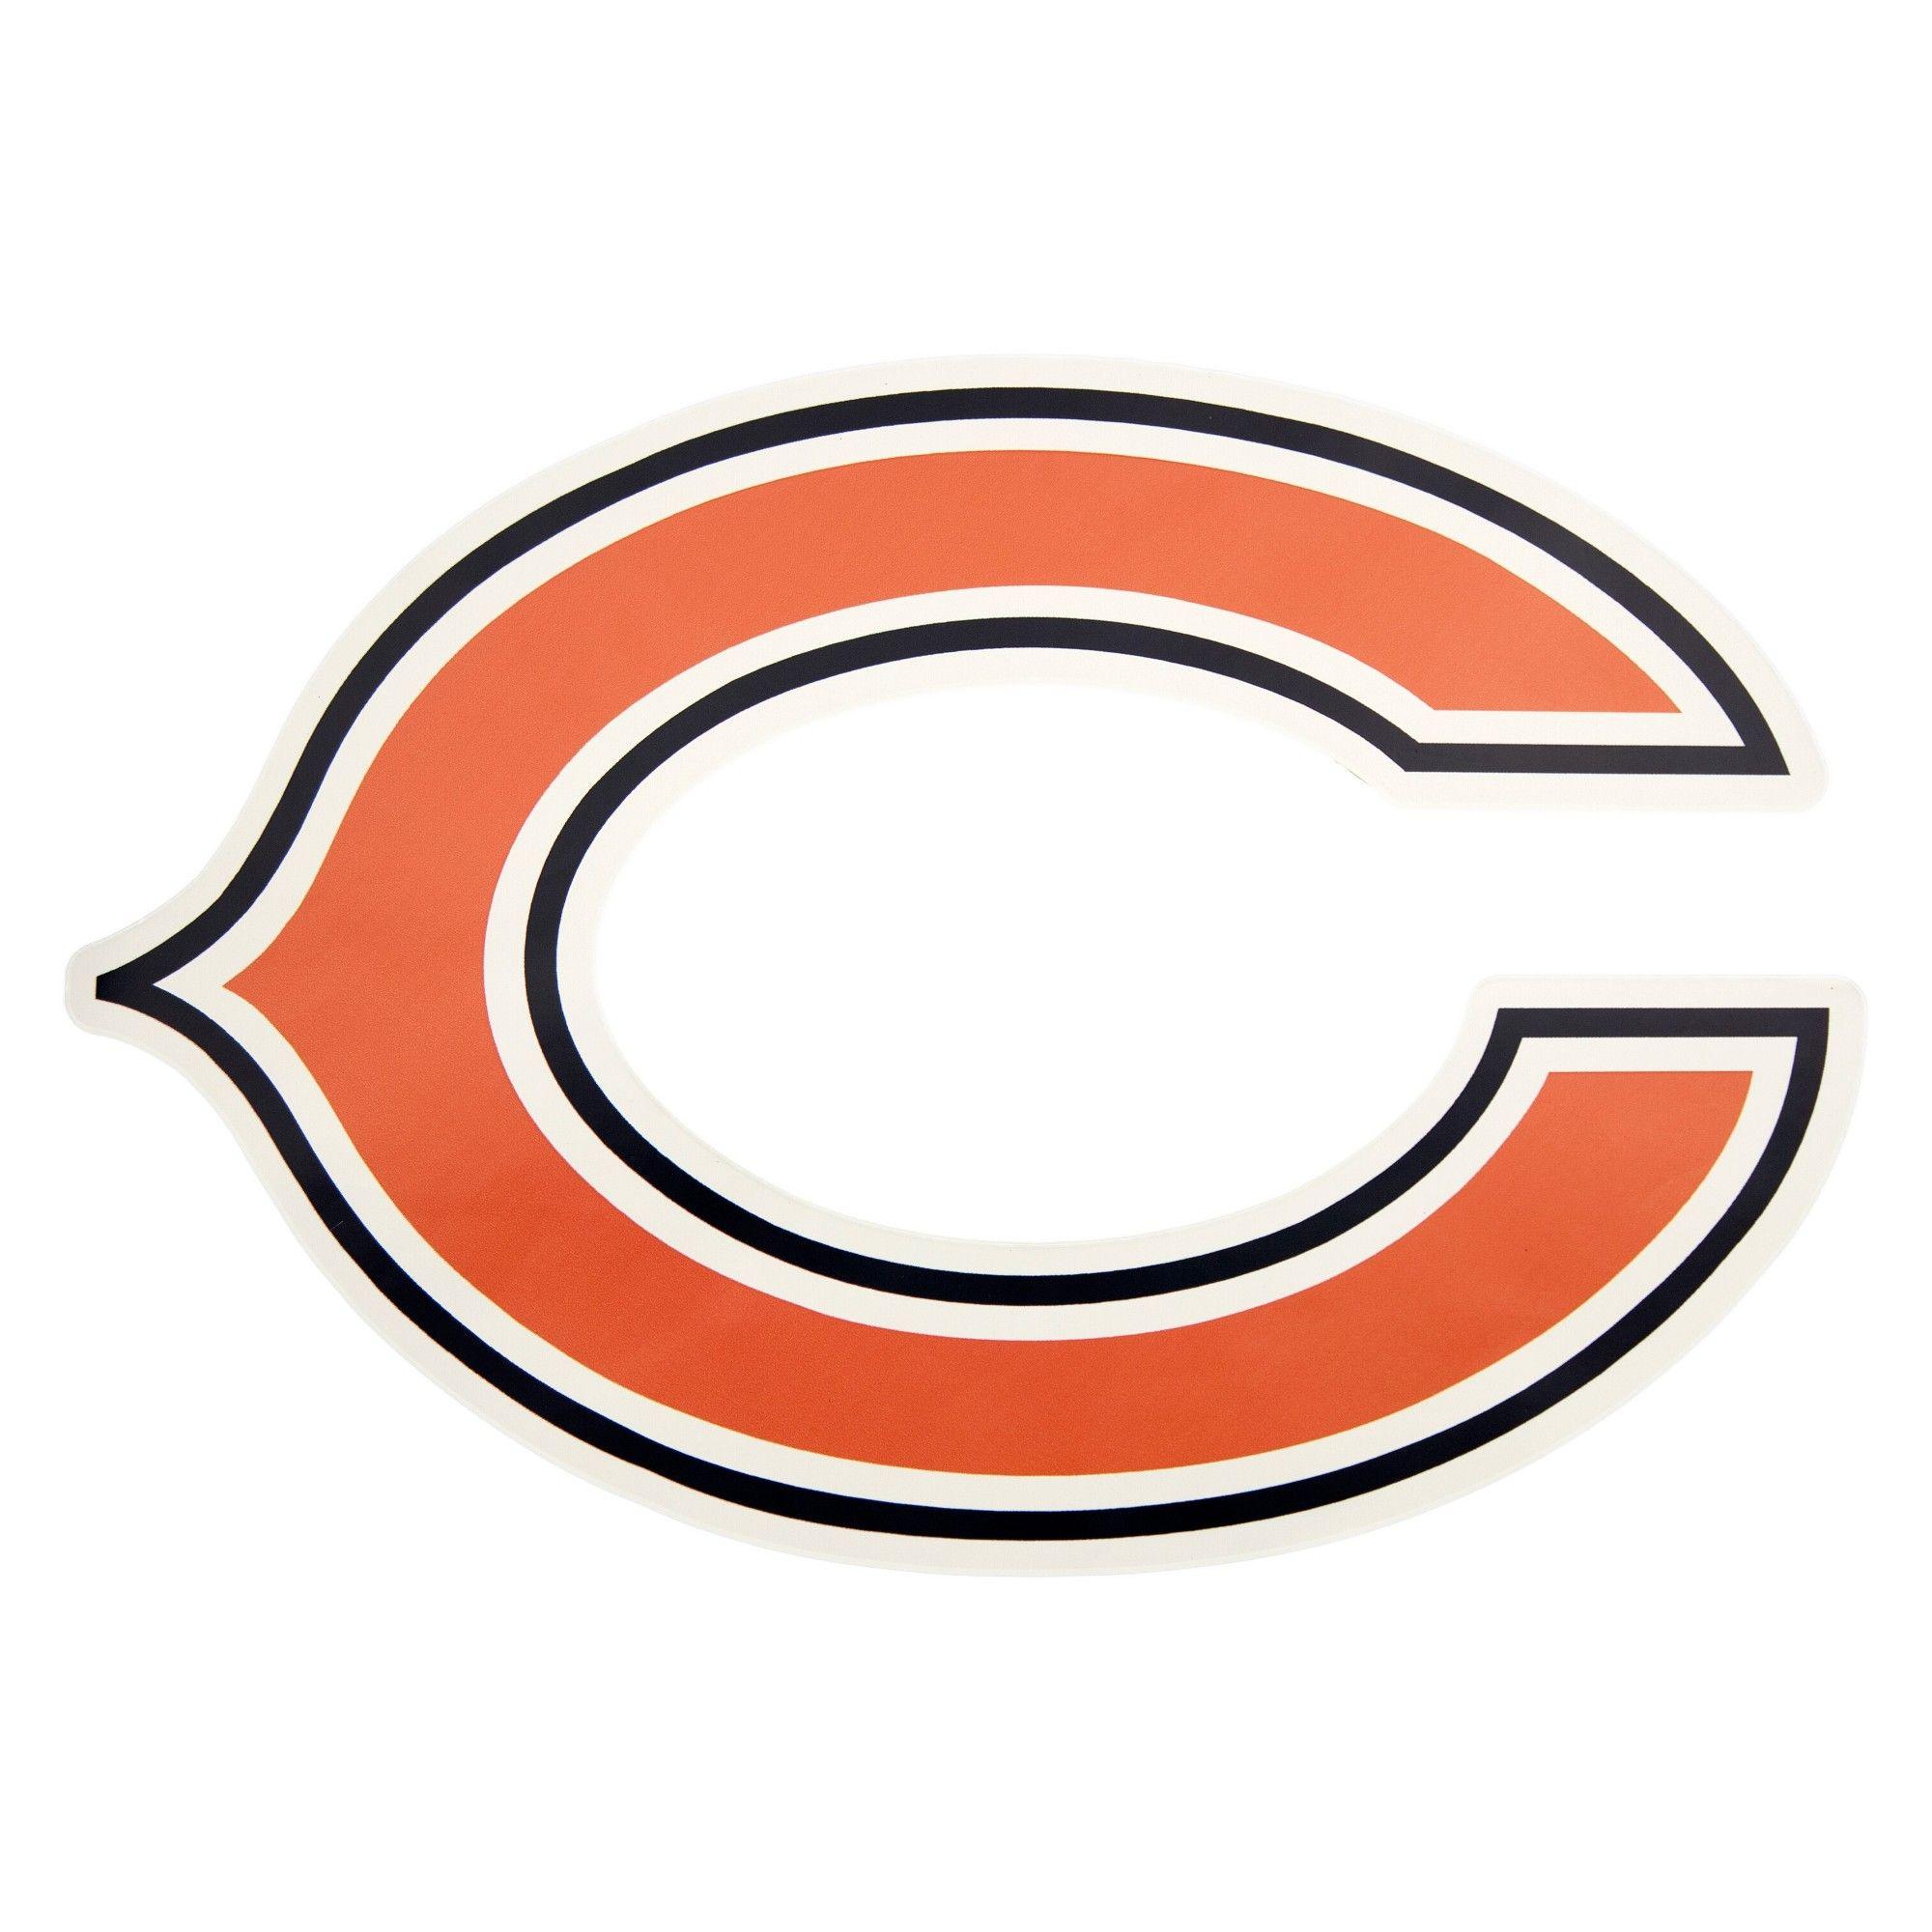 NFL Chicago Bears Small Outdoor Logo Decal Outdoor logos